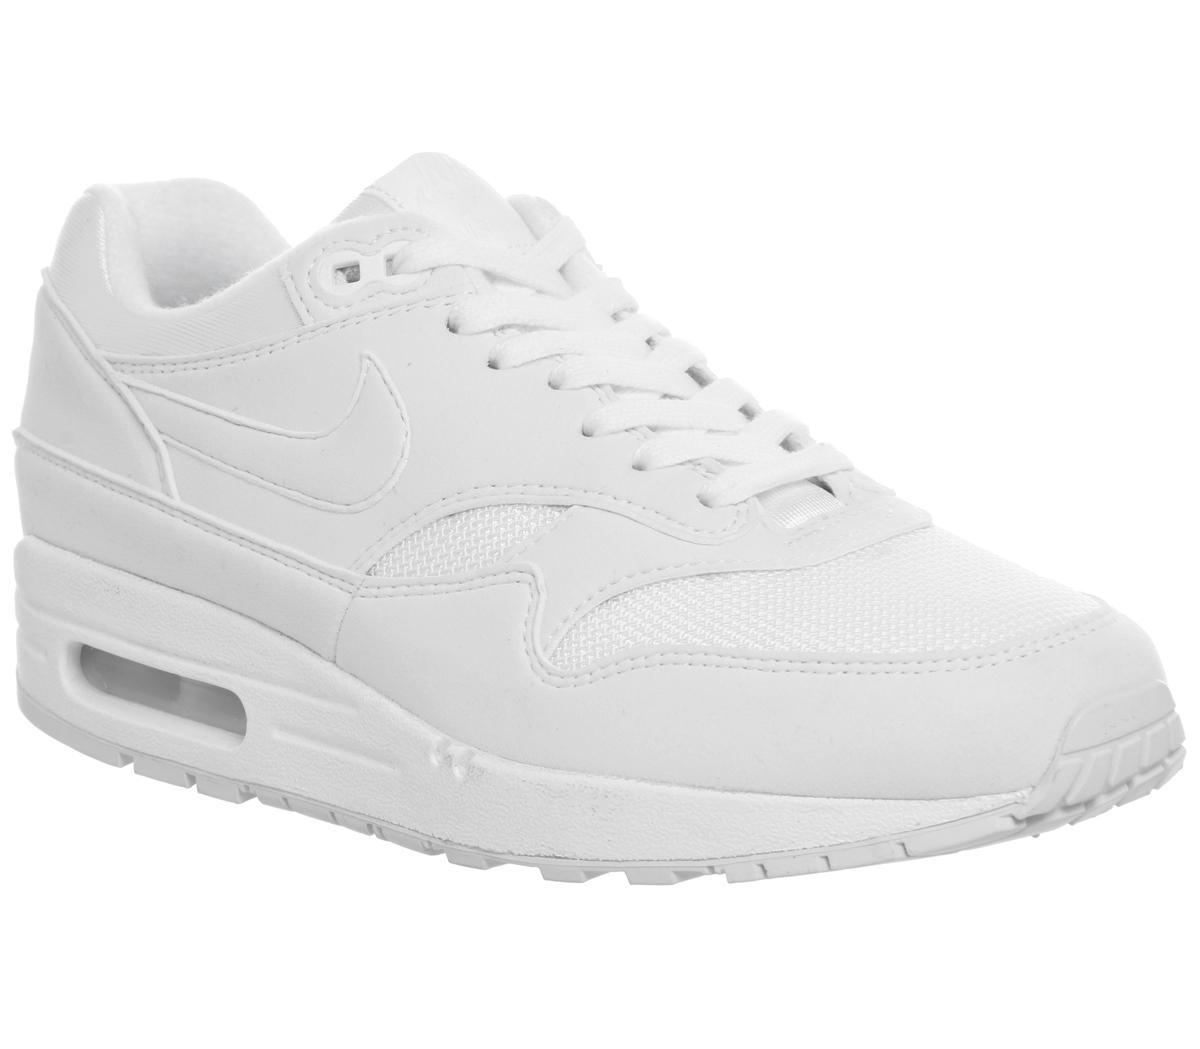 Nike Air Max 1 White White Pure